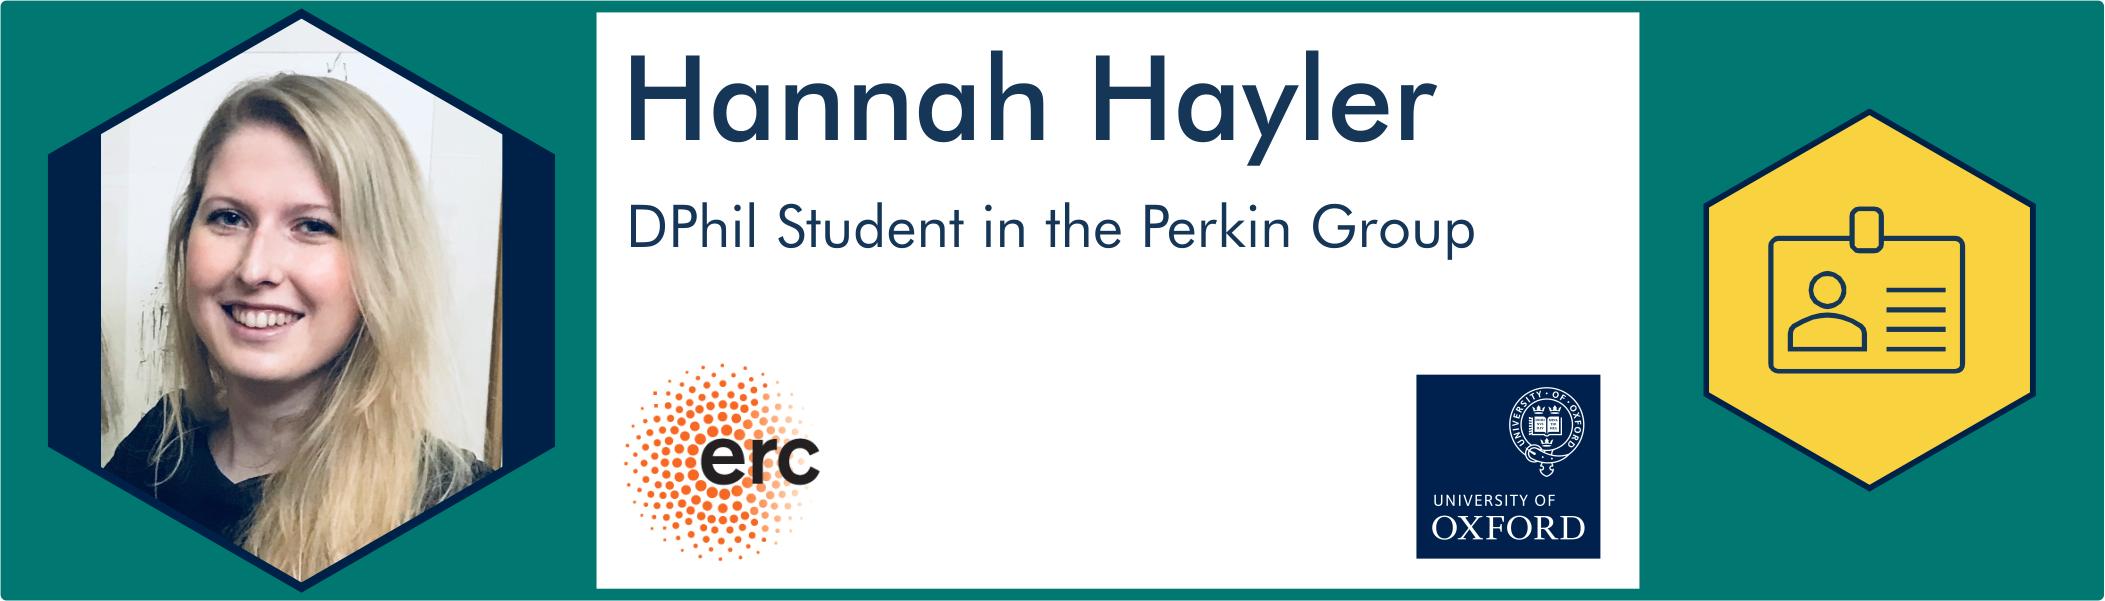 Hannah Hayler further info